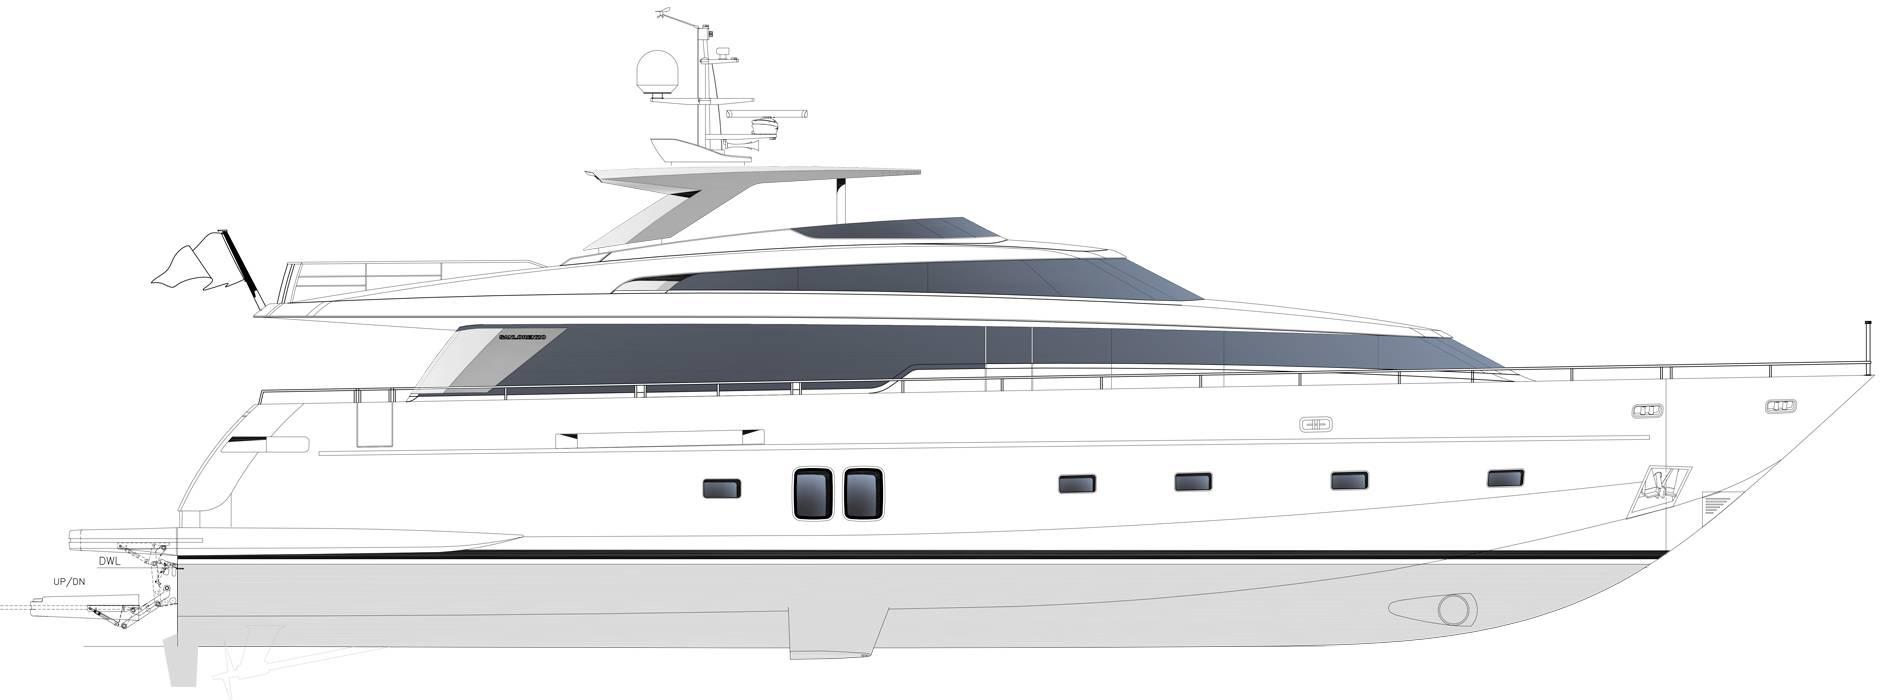 Sanlorenzo Yachts SL96-635 Профиль